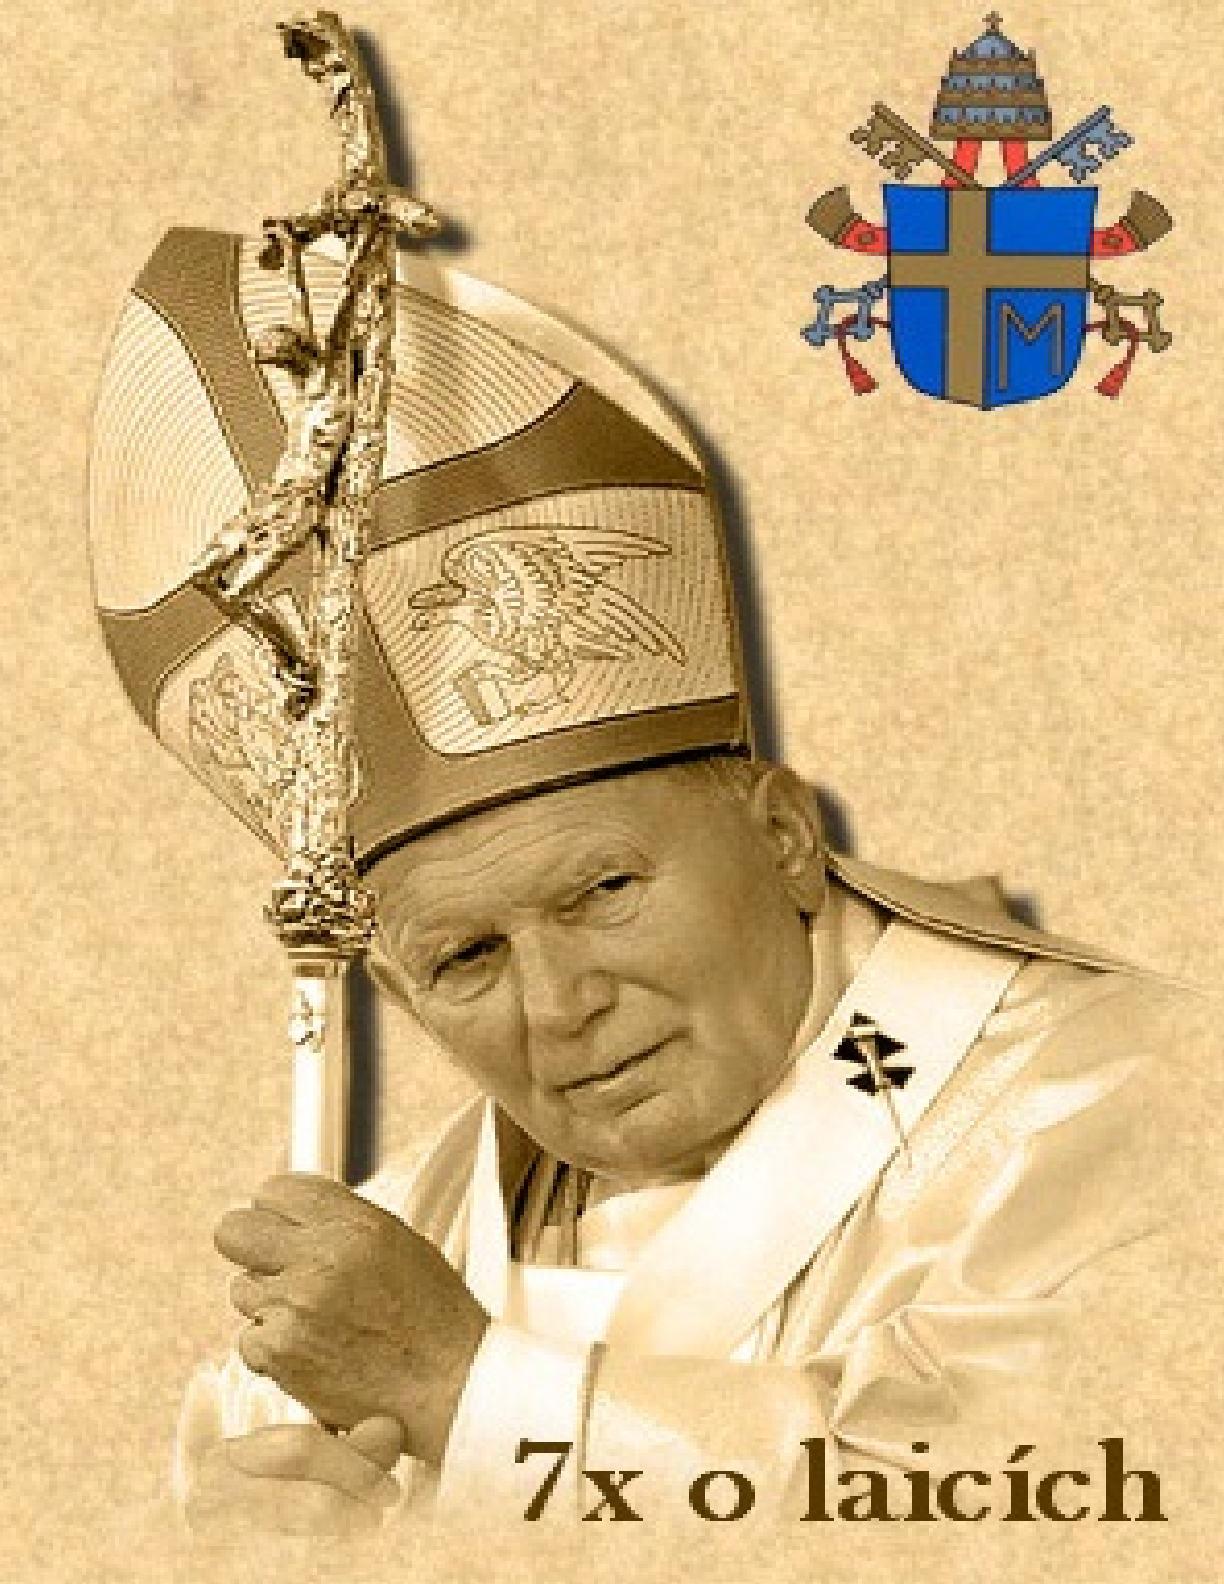 Jan Pavel II – 7x o laikoch